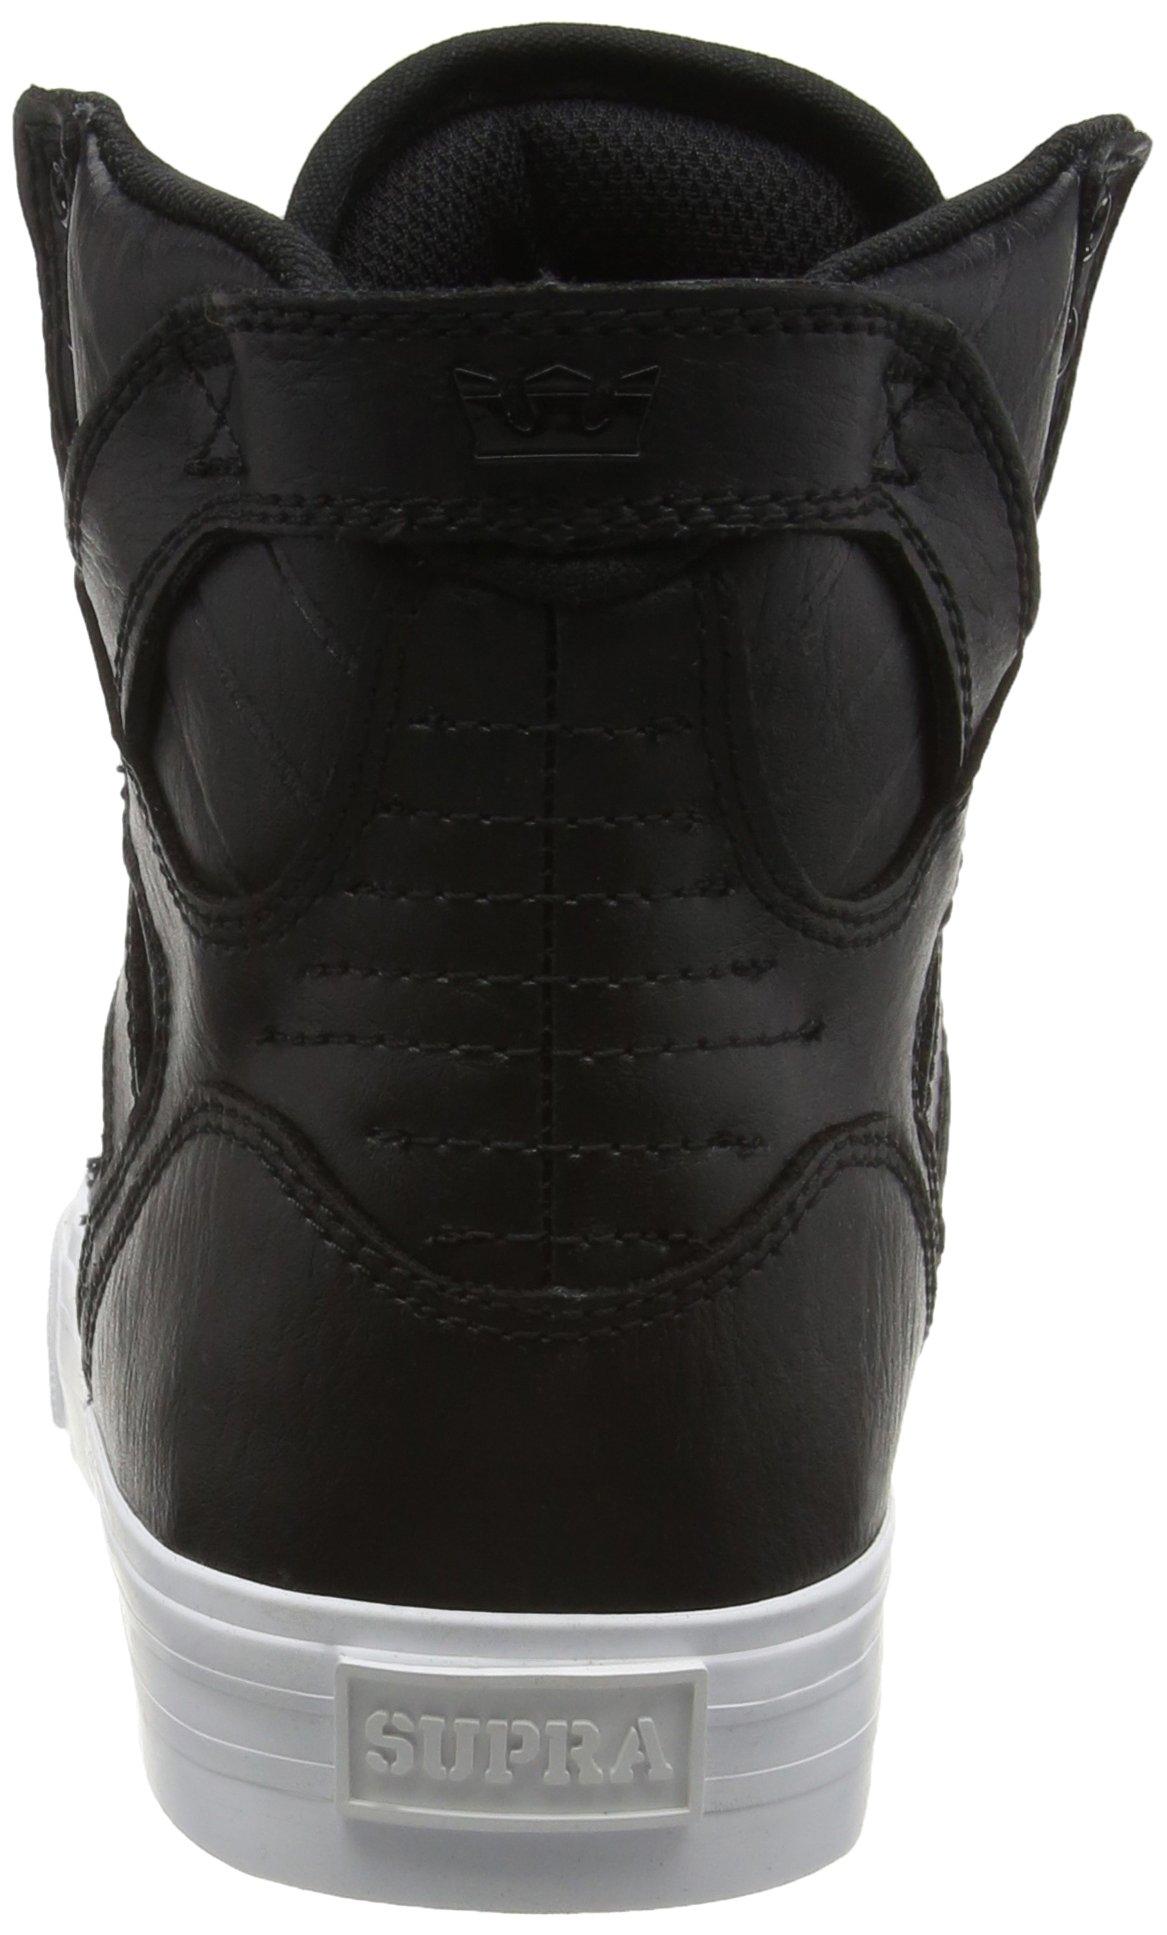 Supra Skytop Skate Shoe, Black/White, 5.5 Regular US by Supra (Image #2)